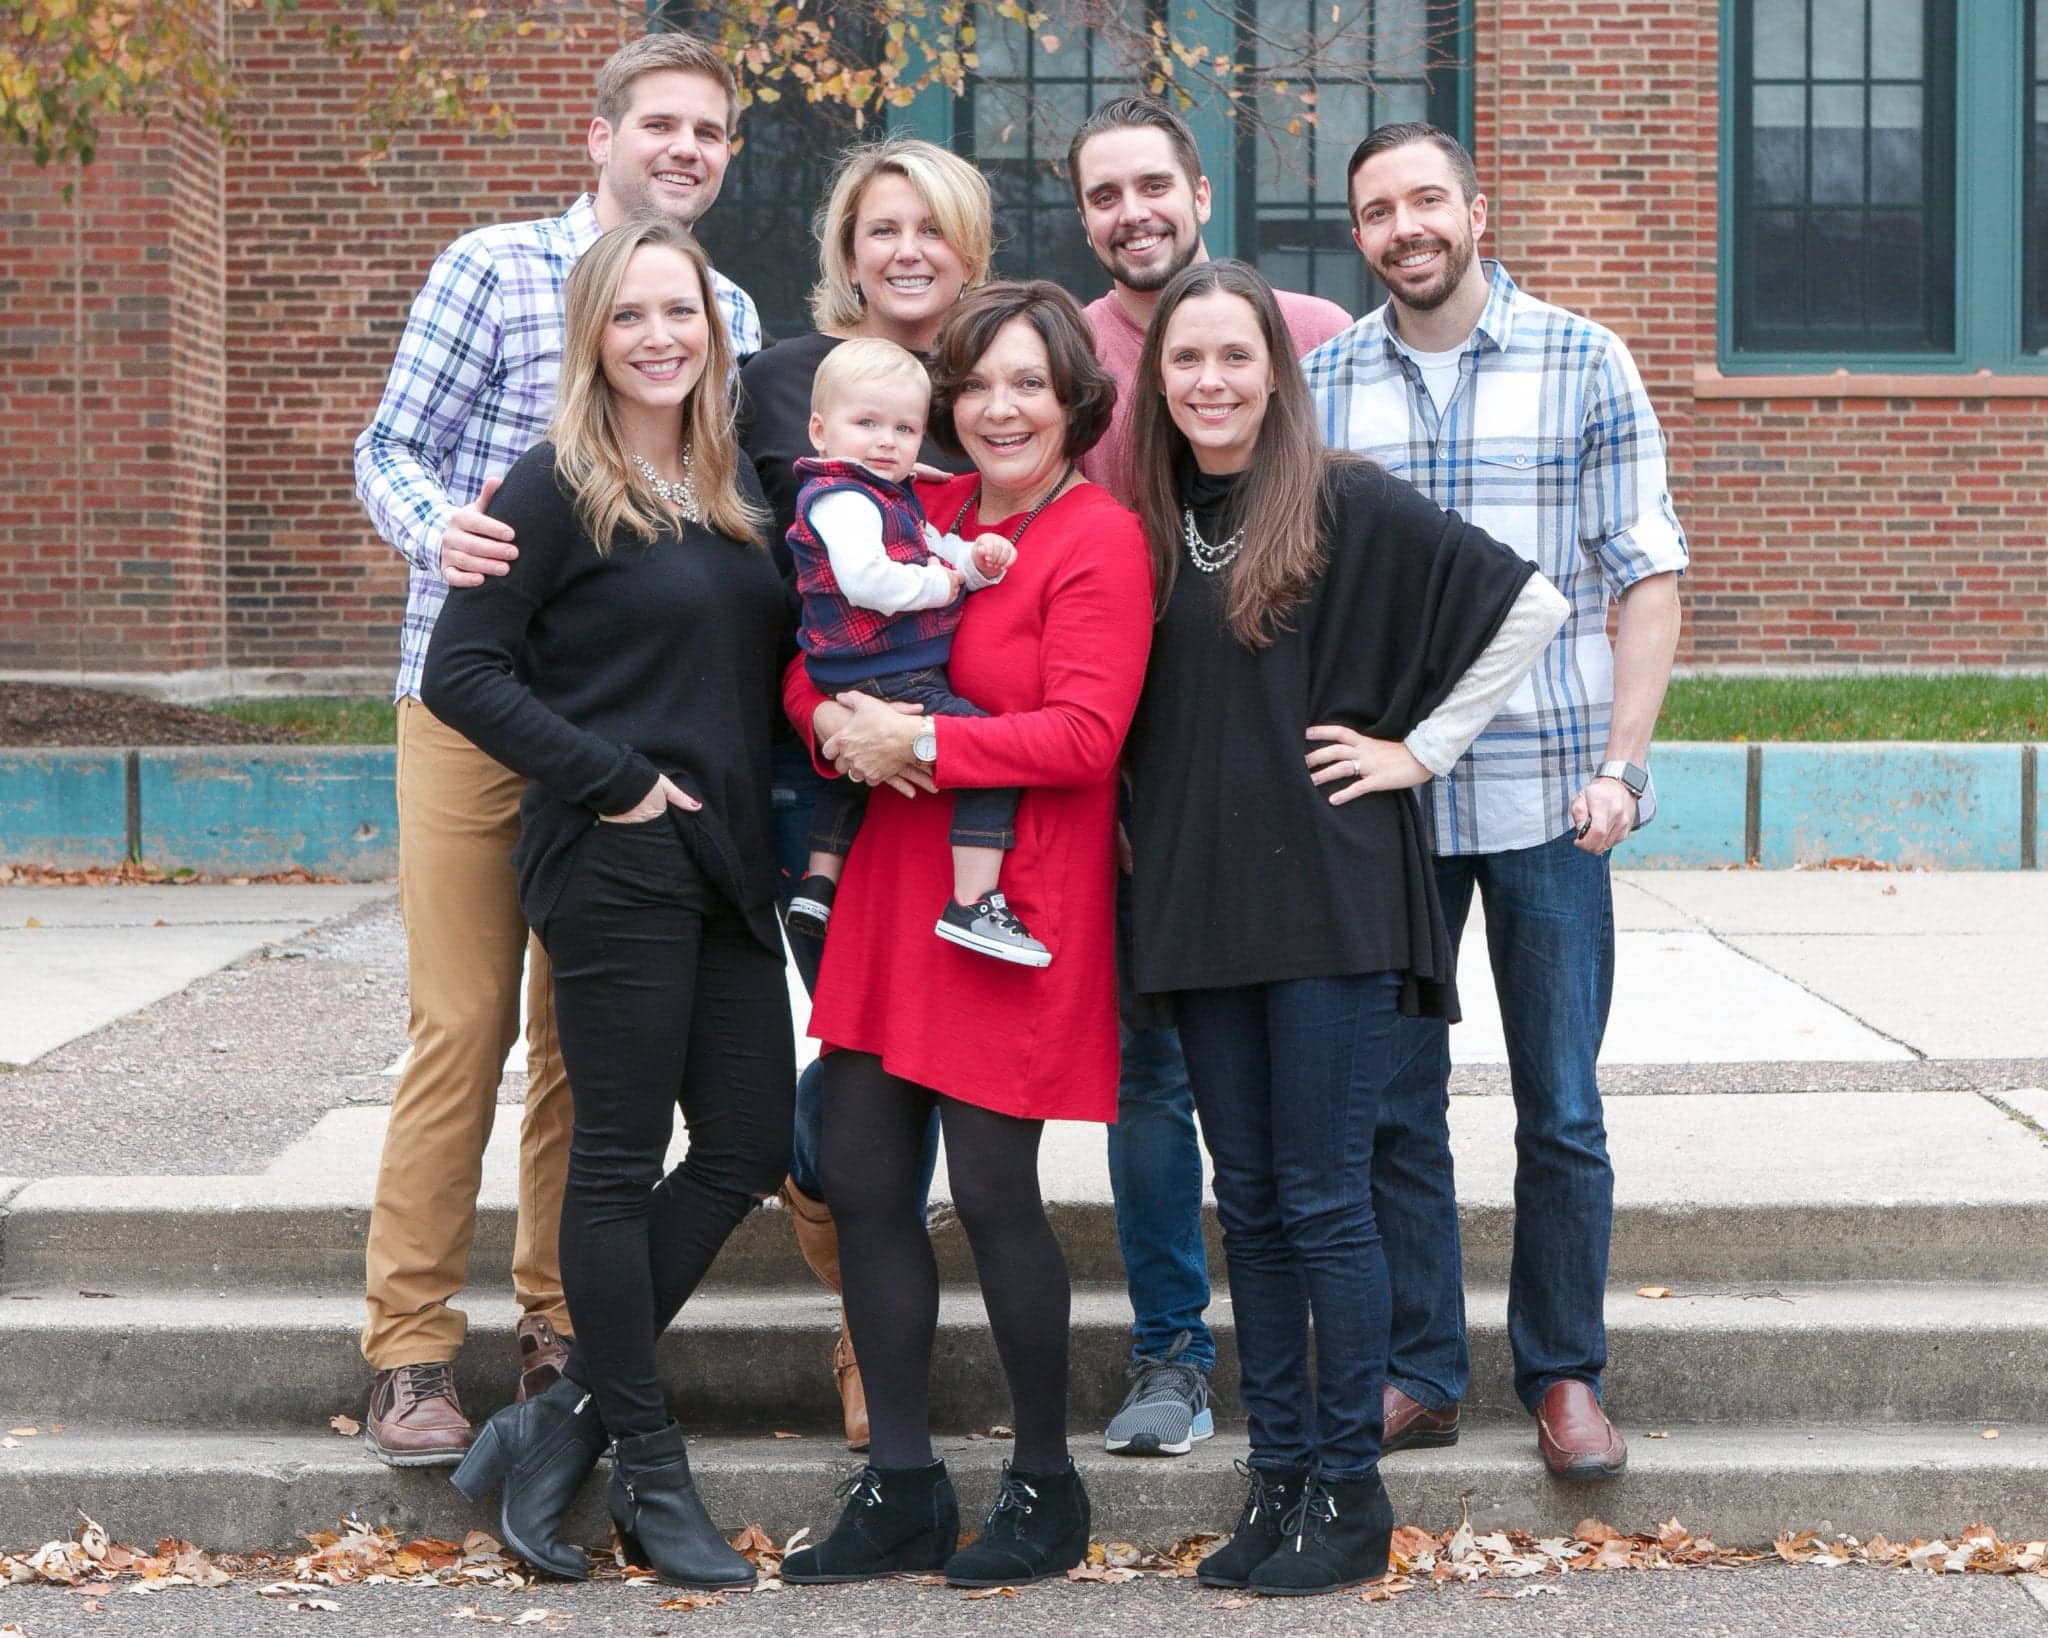 Casey's family photo